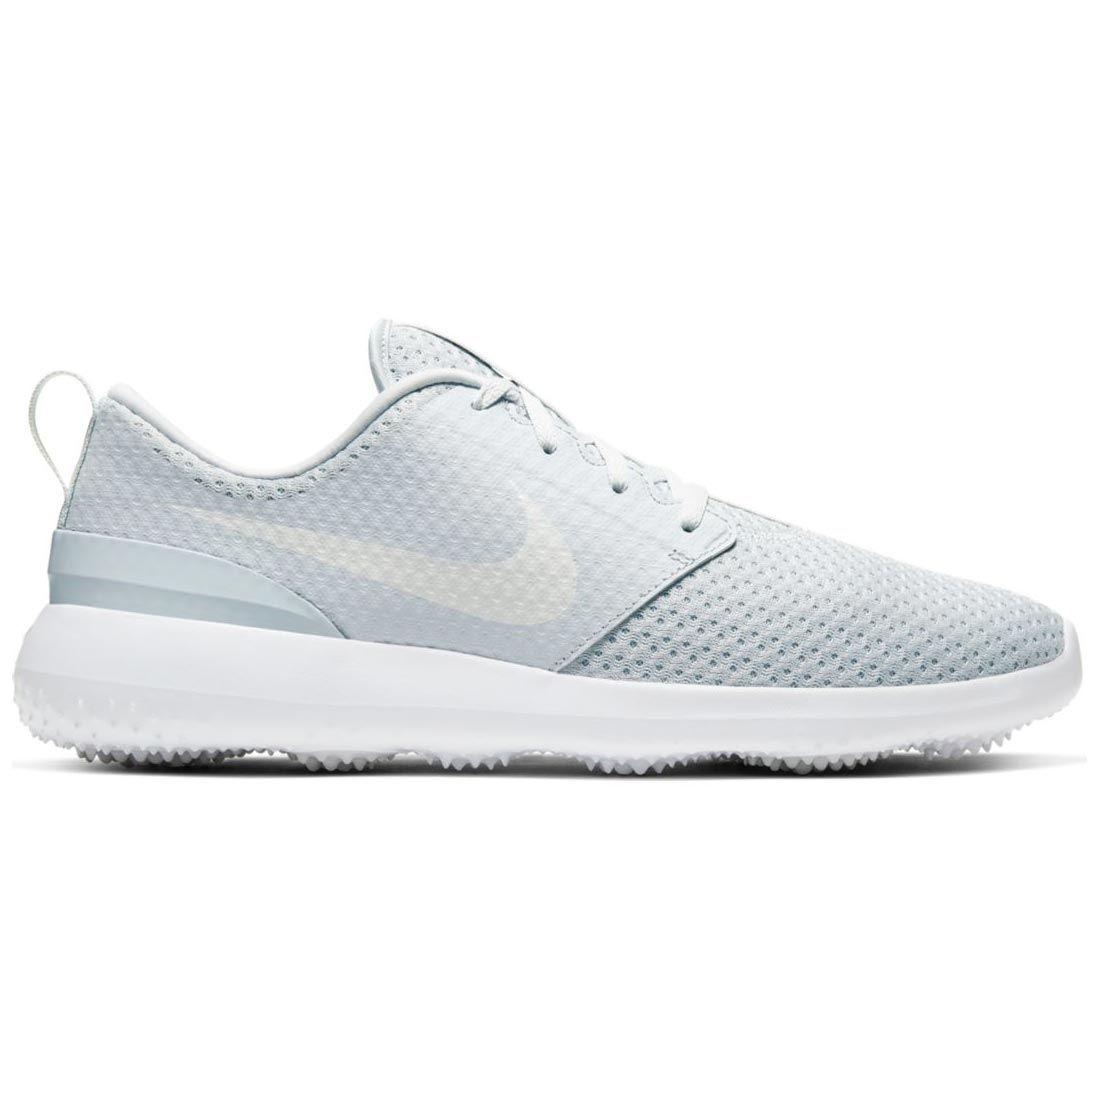 sed desierto Conciliador  Buy Nike Roshe G Golf Shoes Pure Platinum/White | Golf Discount